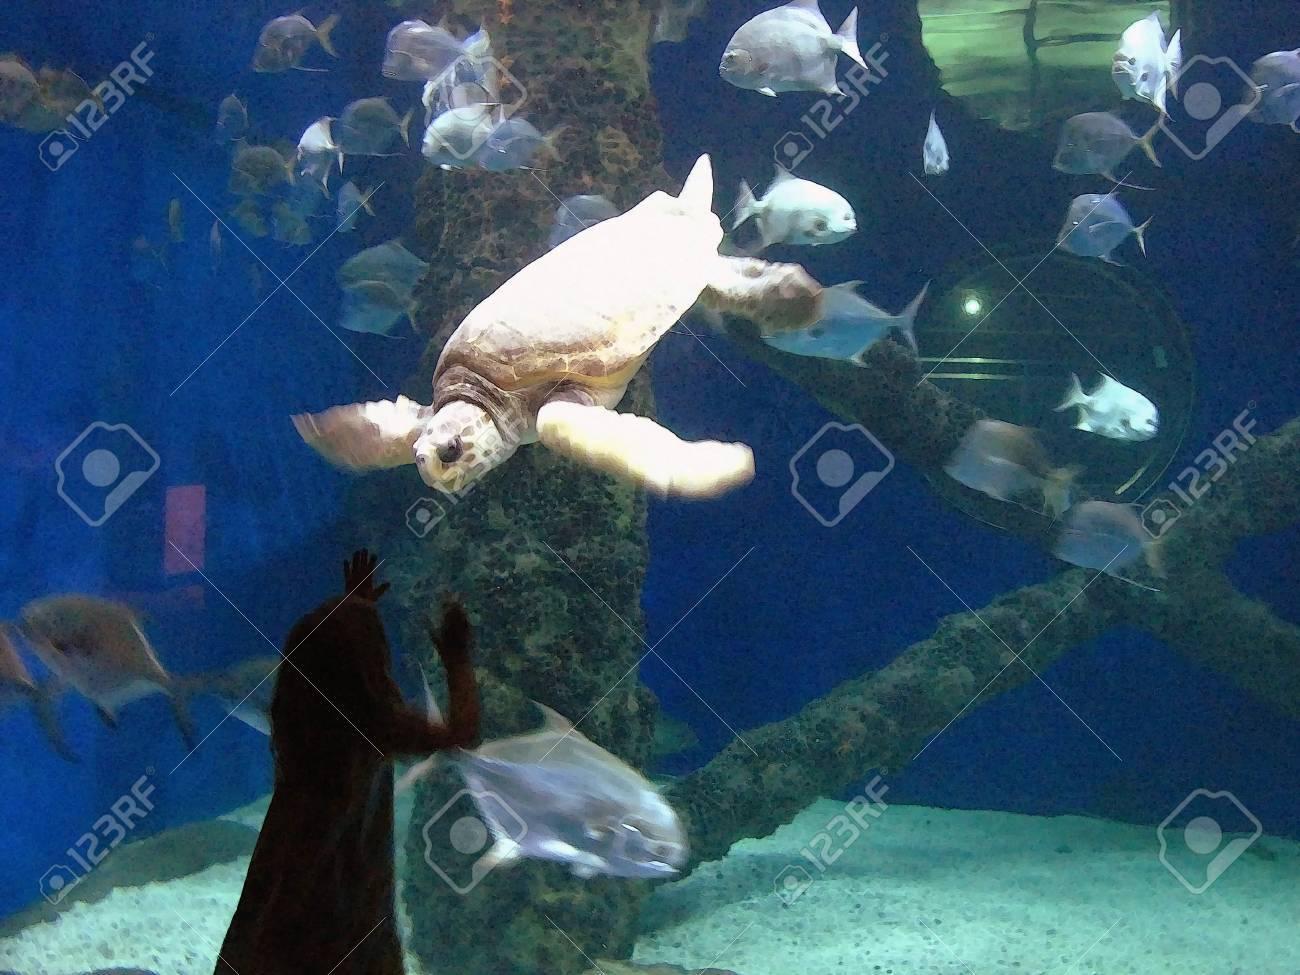 Fish in tank swimming - Stock Photo Little Girl Watching Turtle And Fish Swimming In A Tank In A Watercolor Art Effect